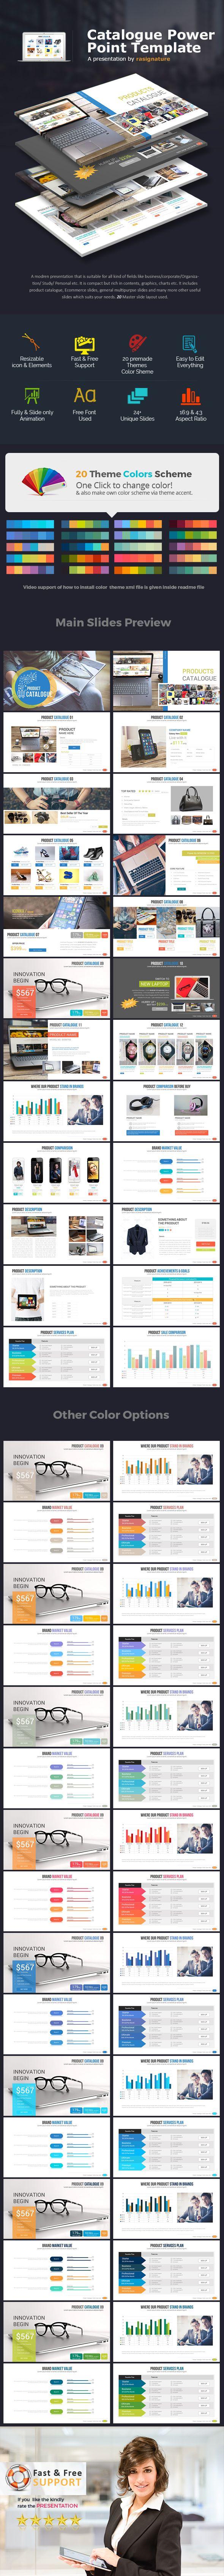 131 best powerpoint's presentation images on pinterest | font logo, Presentation templates